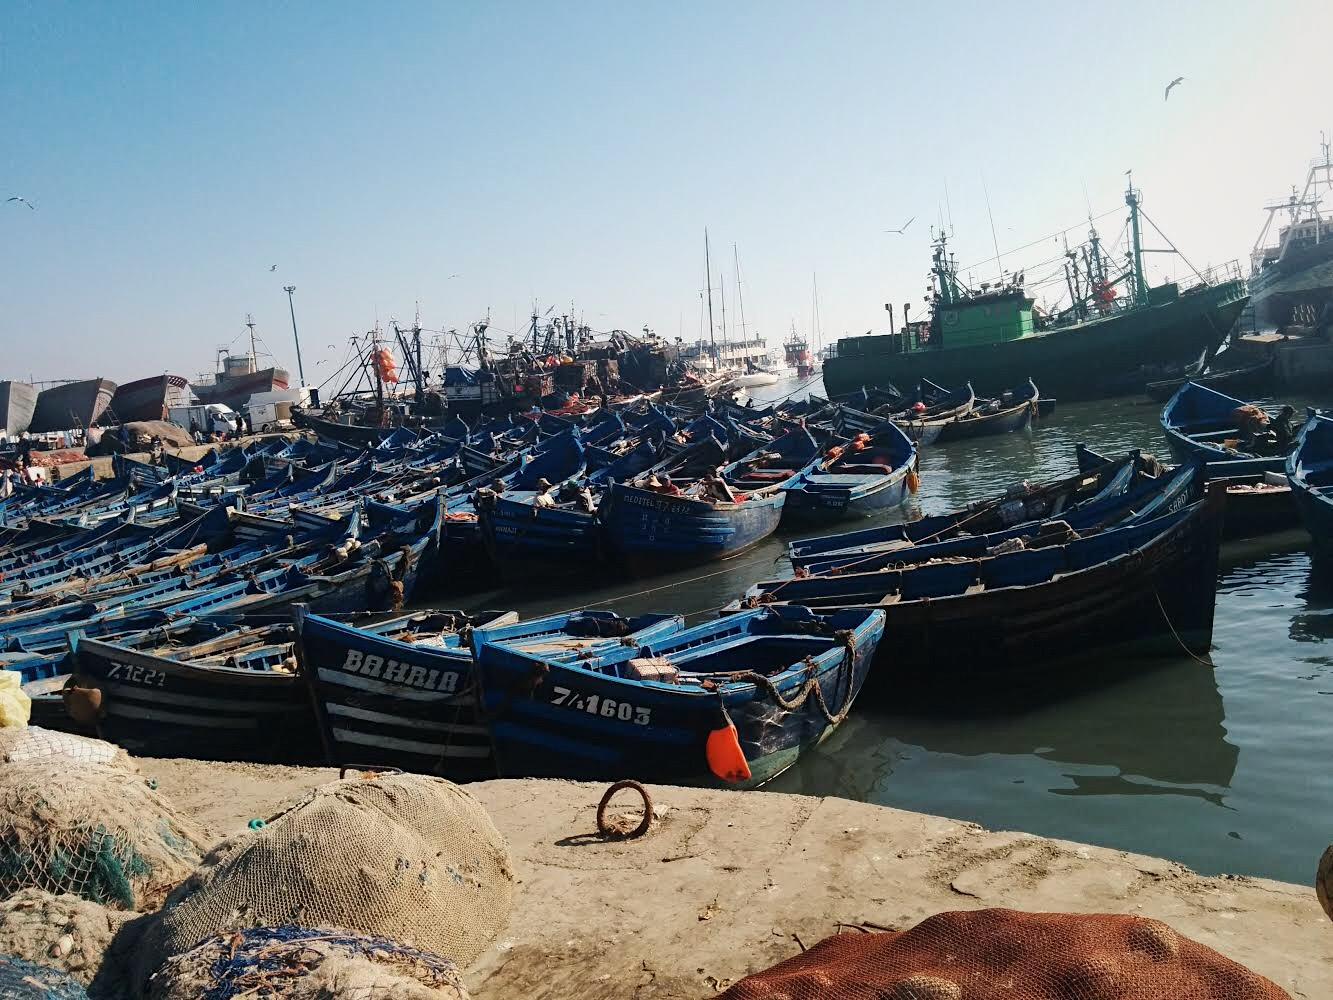 Marruecos Puerto de Essaouira by Lolanoviajasola